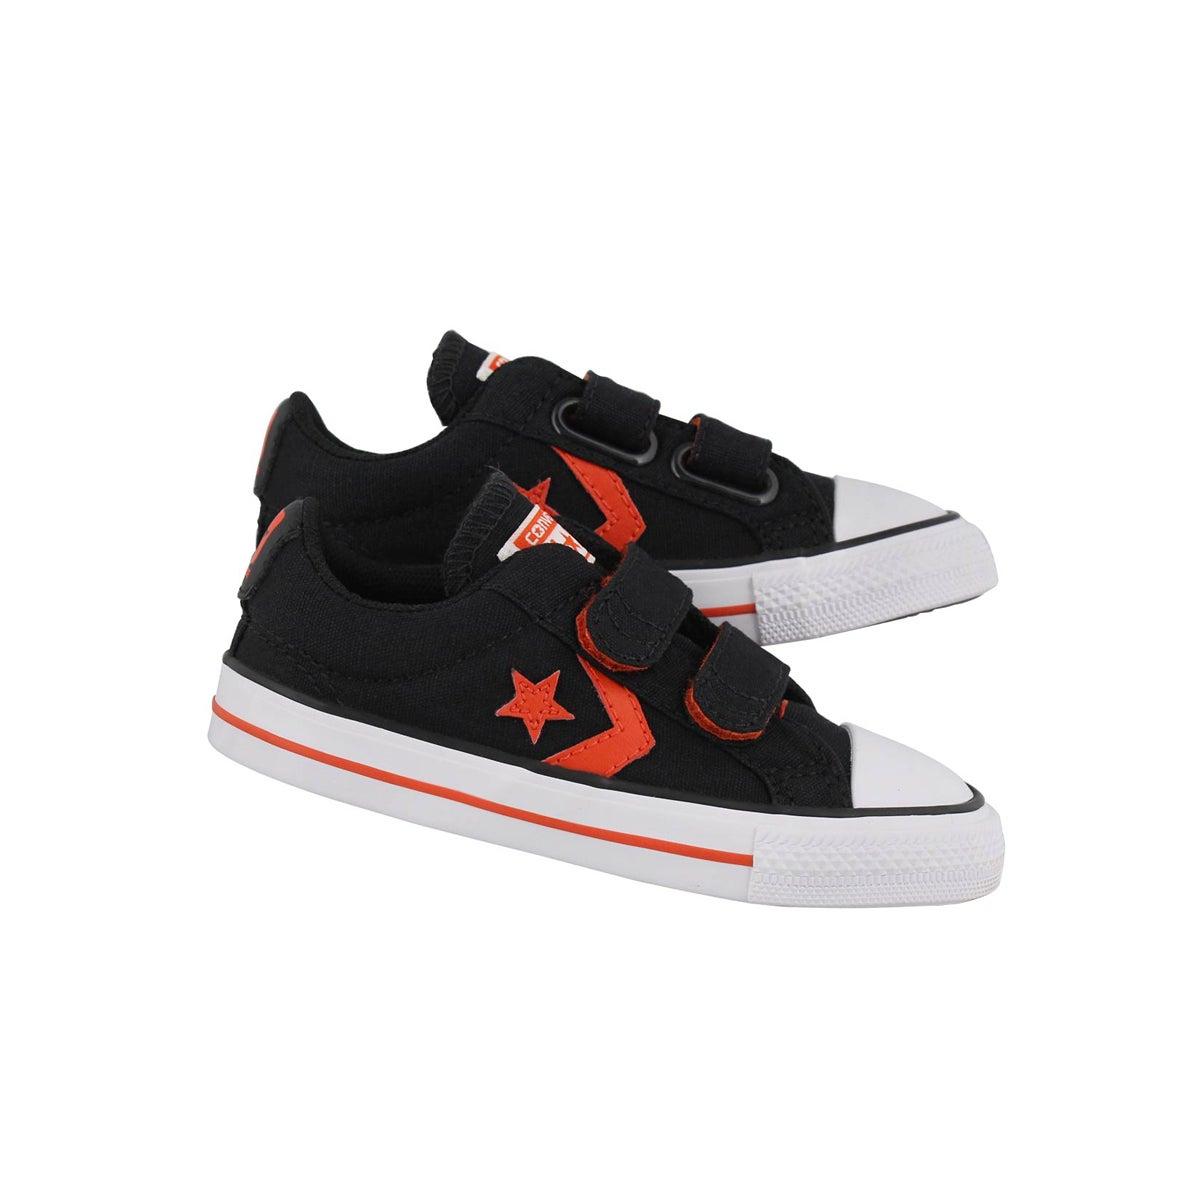 Infs-b Star Player 2V blk/rd/wht sneaker